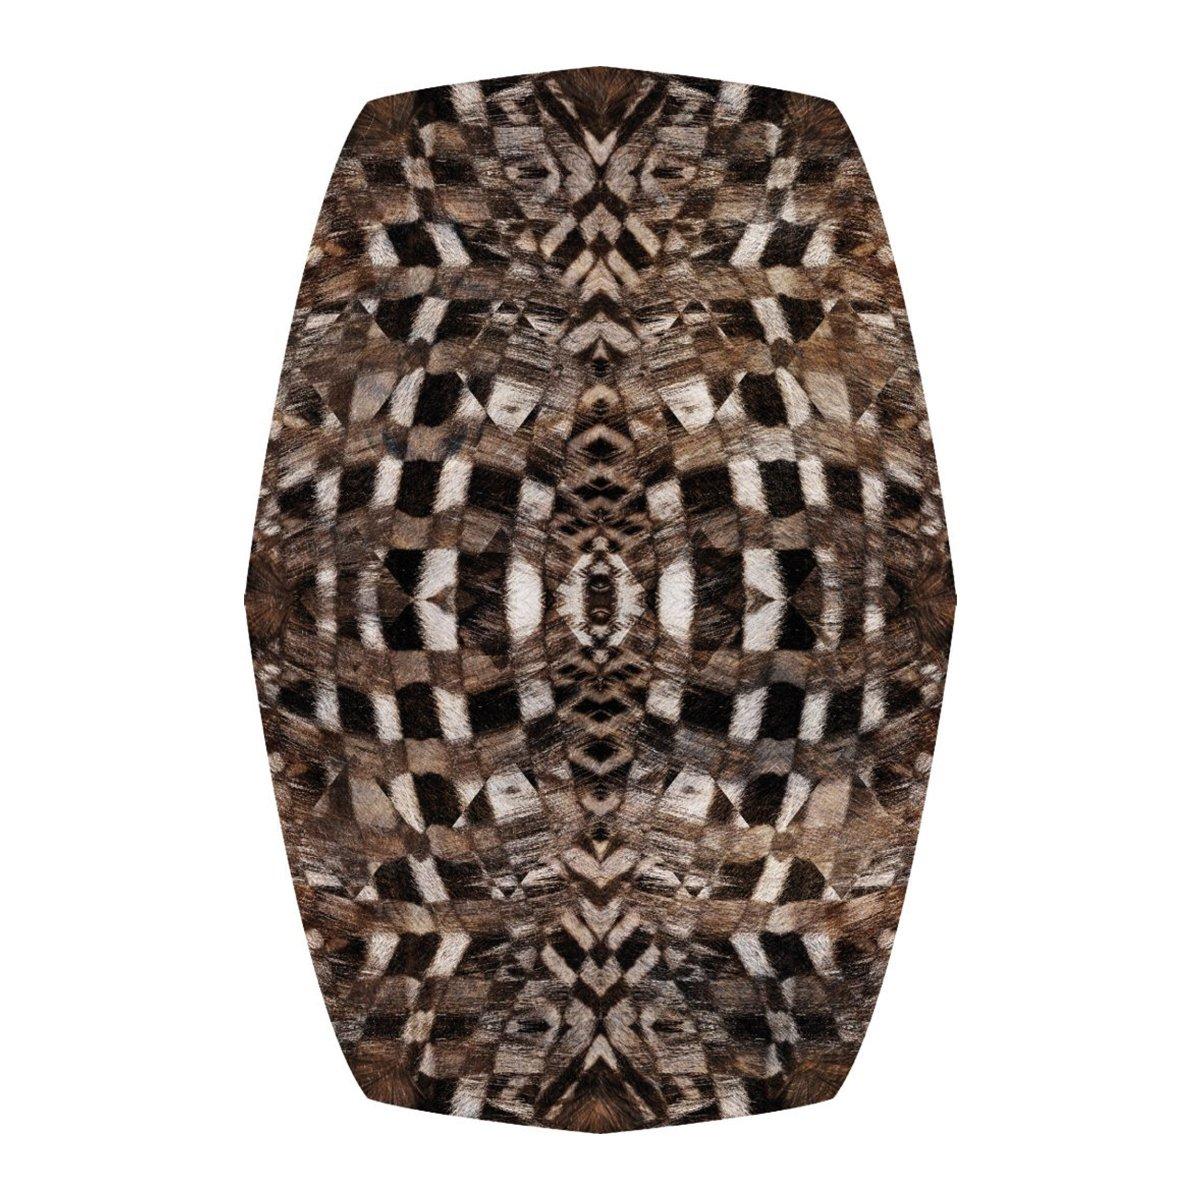 Moooi Carpets - Aristo Quagga Vloerkleed - 400 x 266 cm. - Low Pile